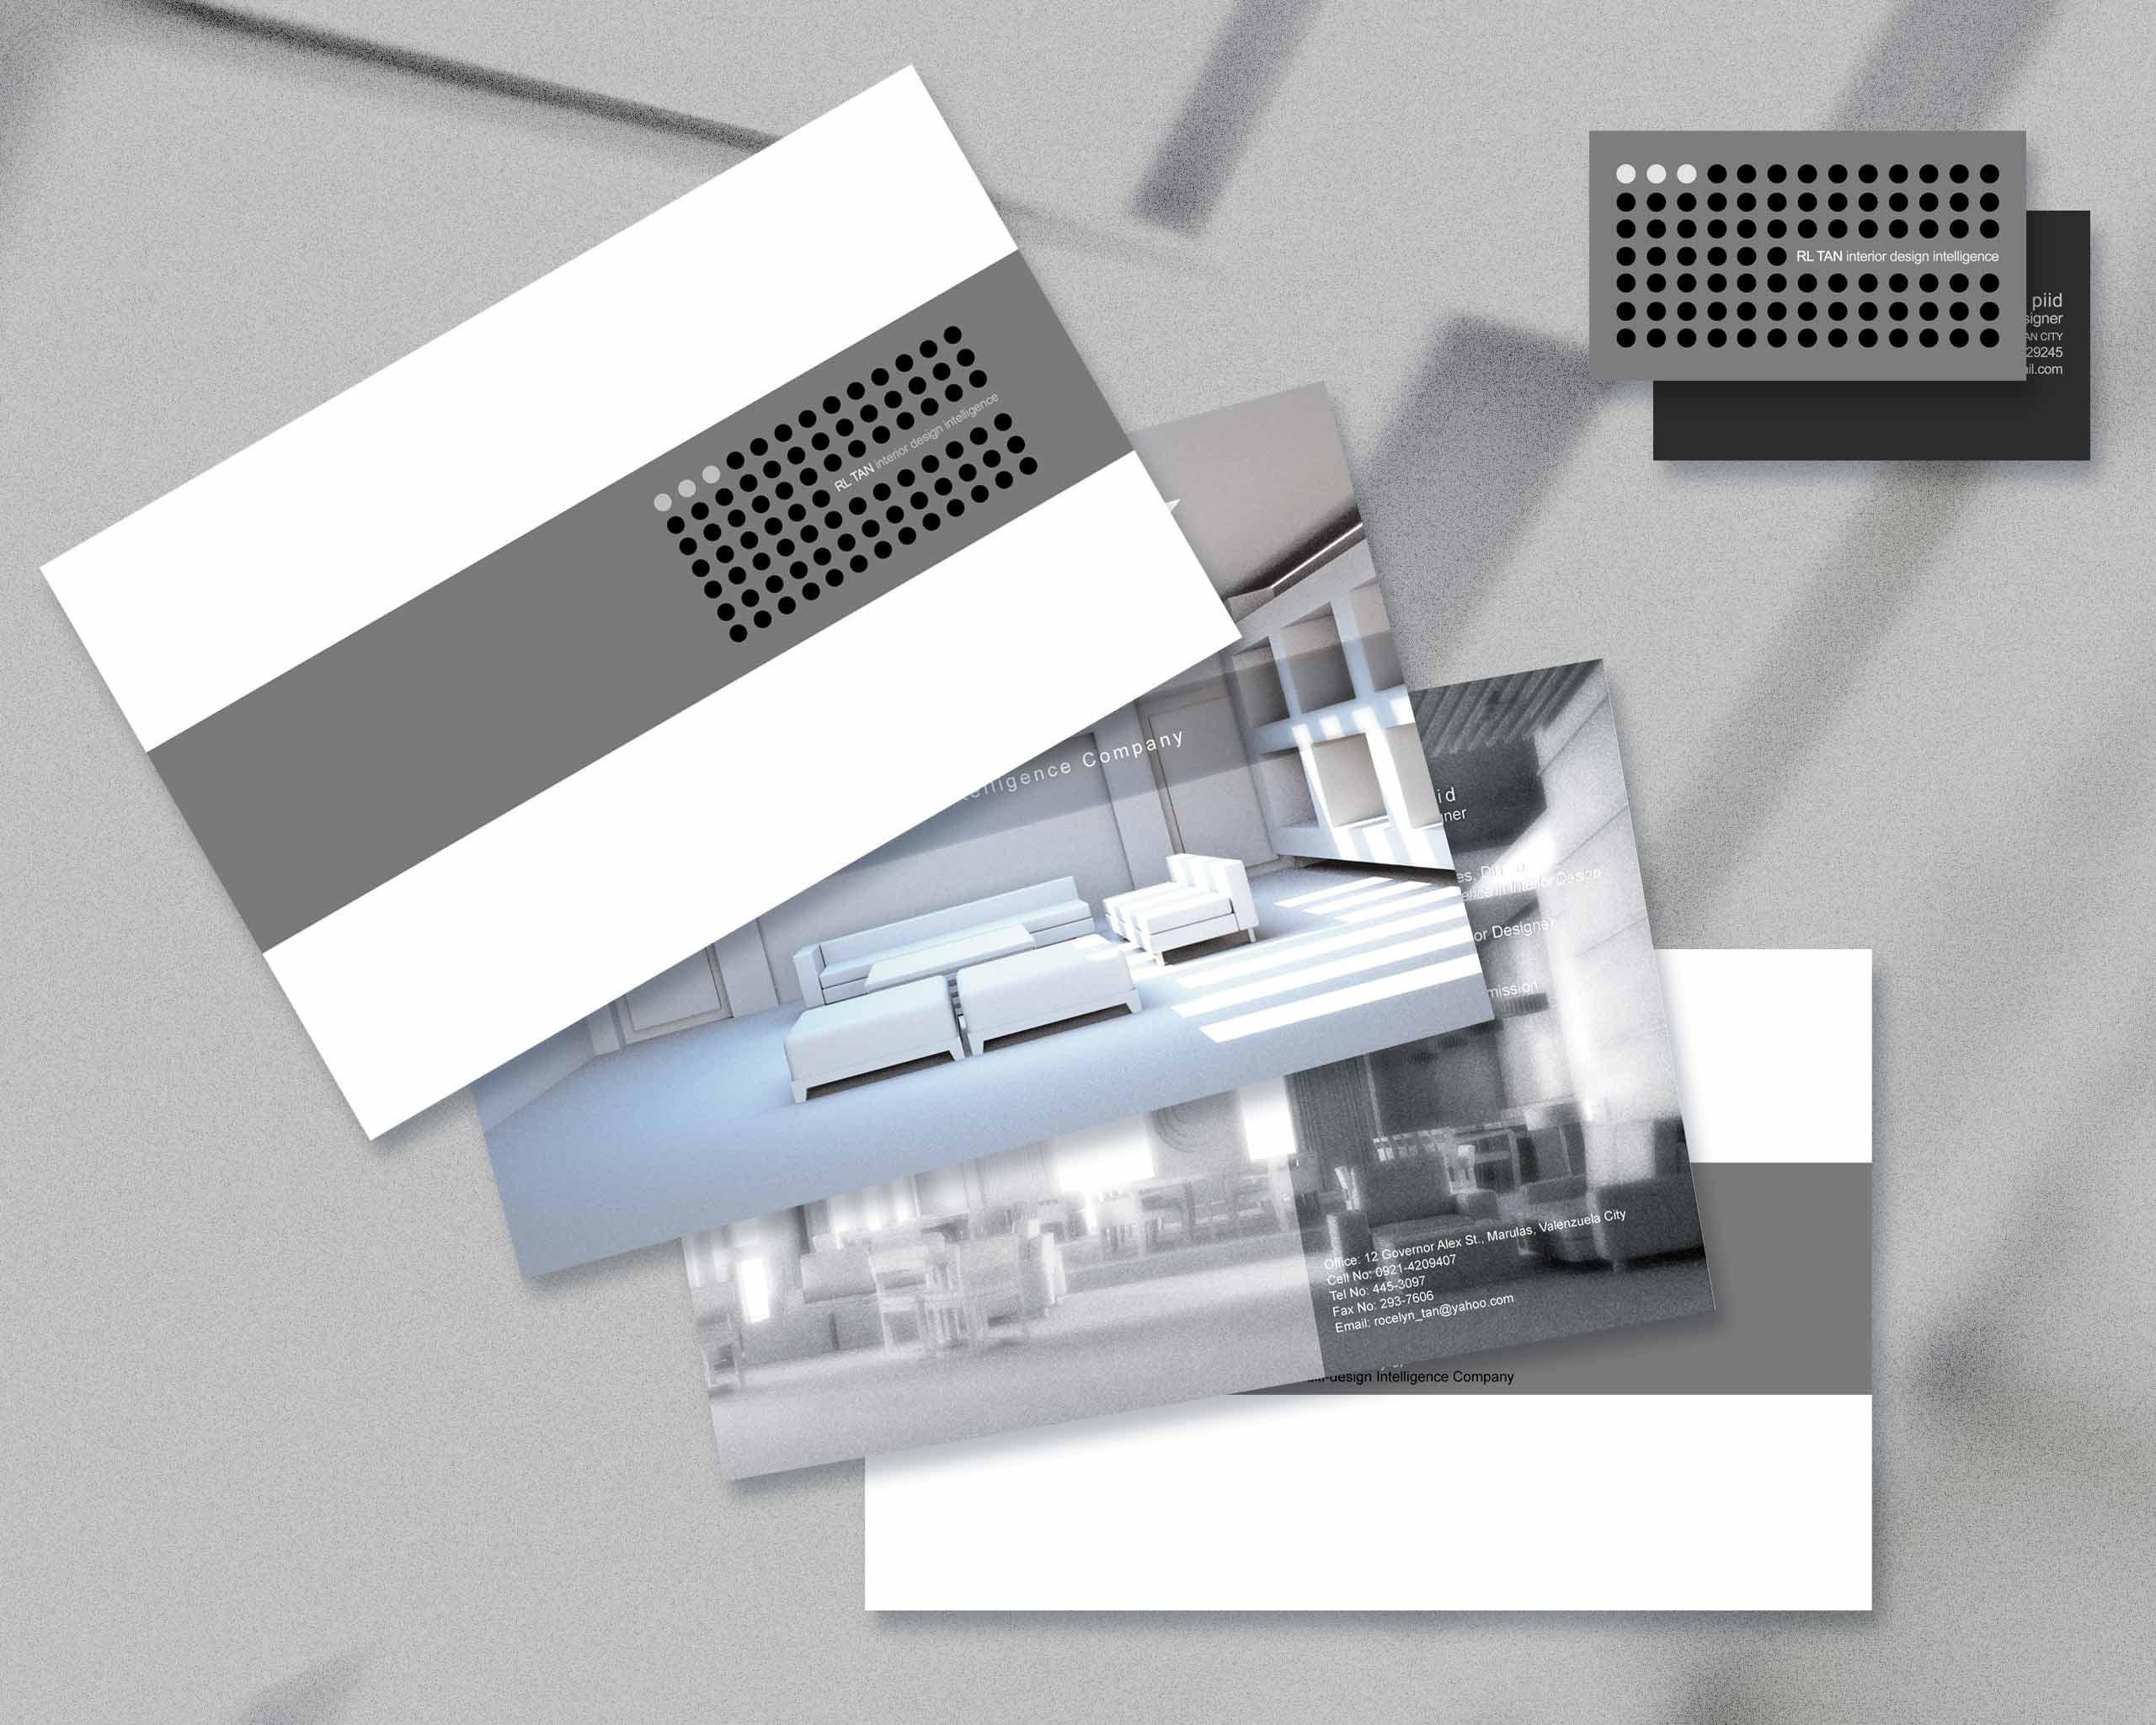 Rl tan interior design company by paultan on deviantart for Architecture and interior design company